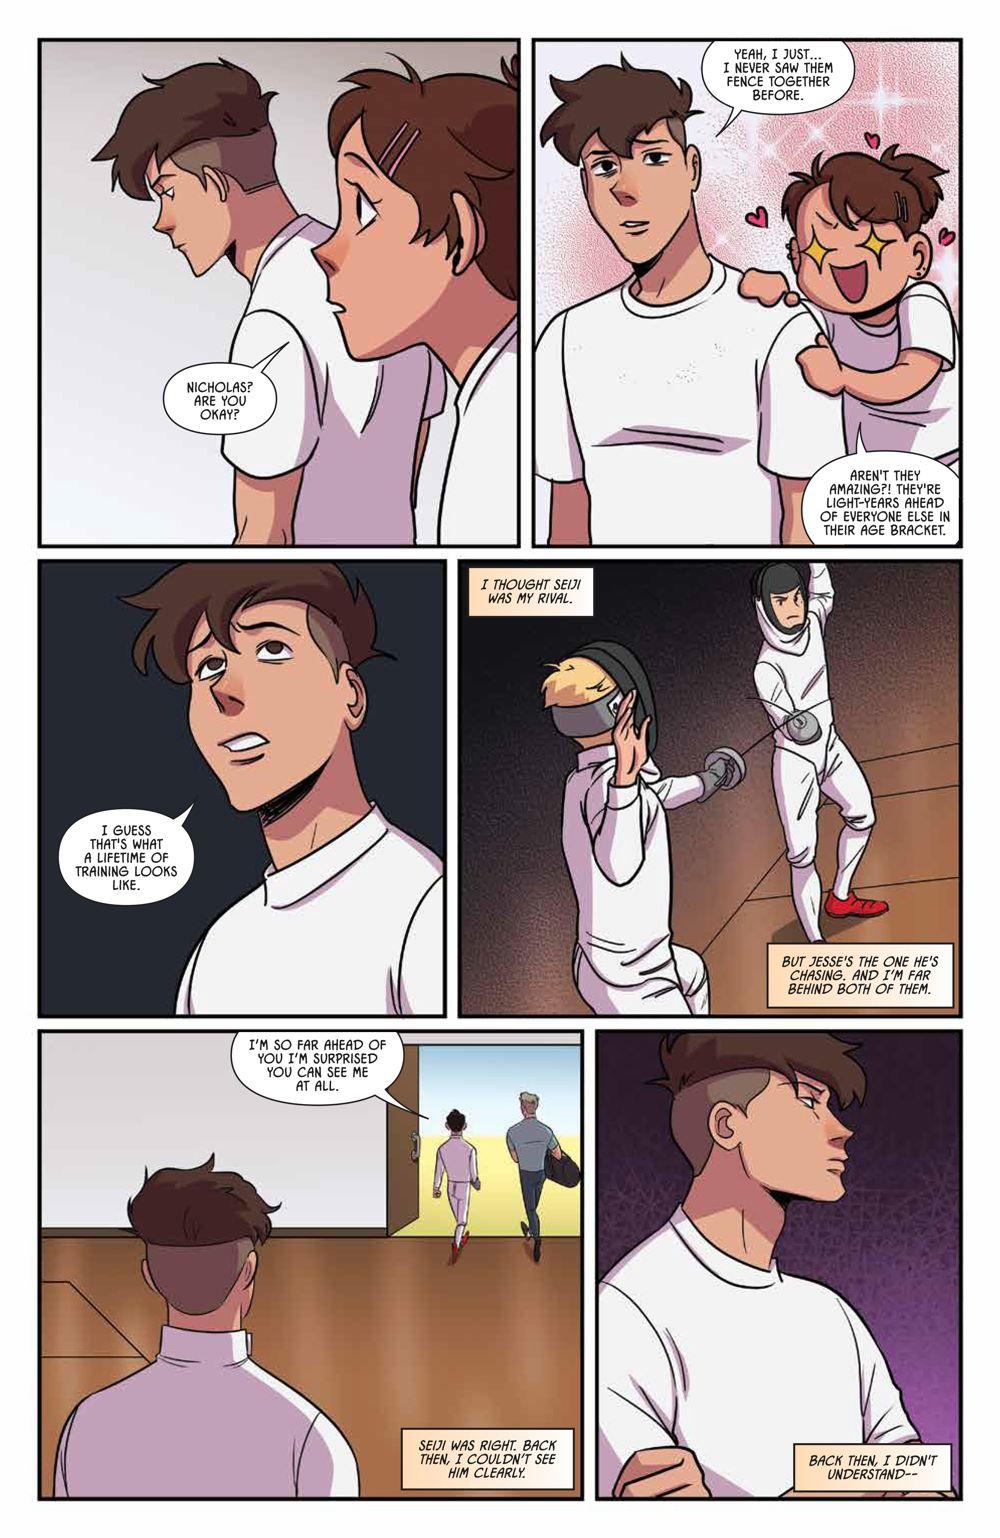 Fence_OGN_Rivals_SC_PRESS_15-1 ComicList Previews: FENCE RIVALS GN